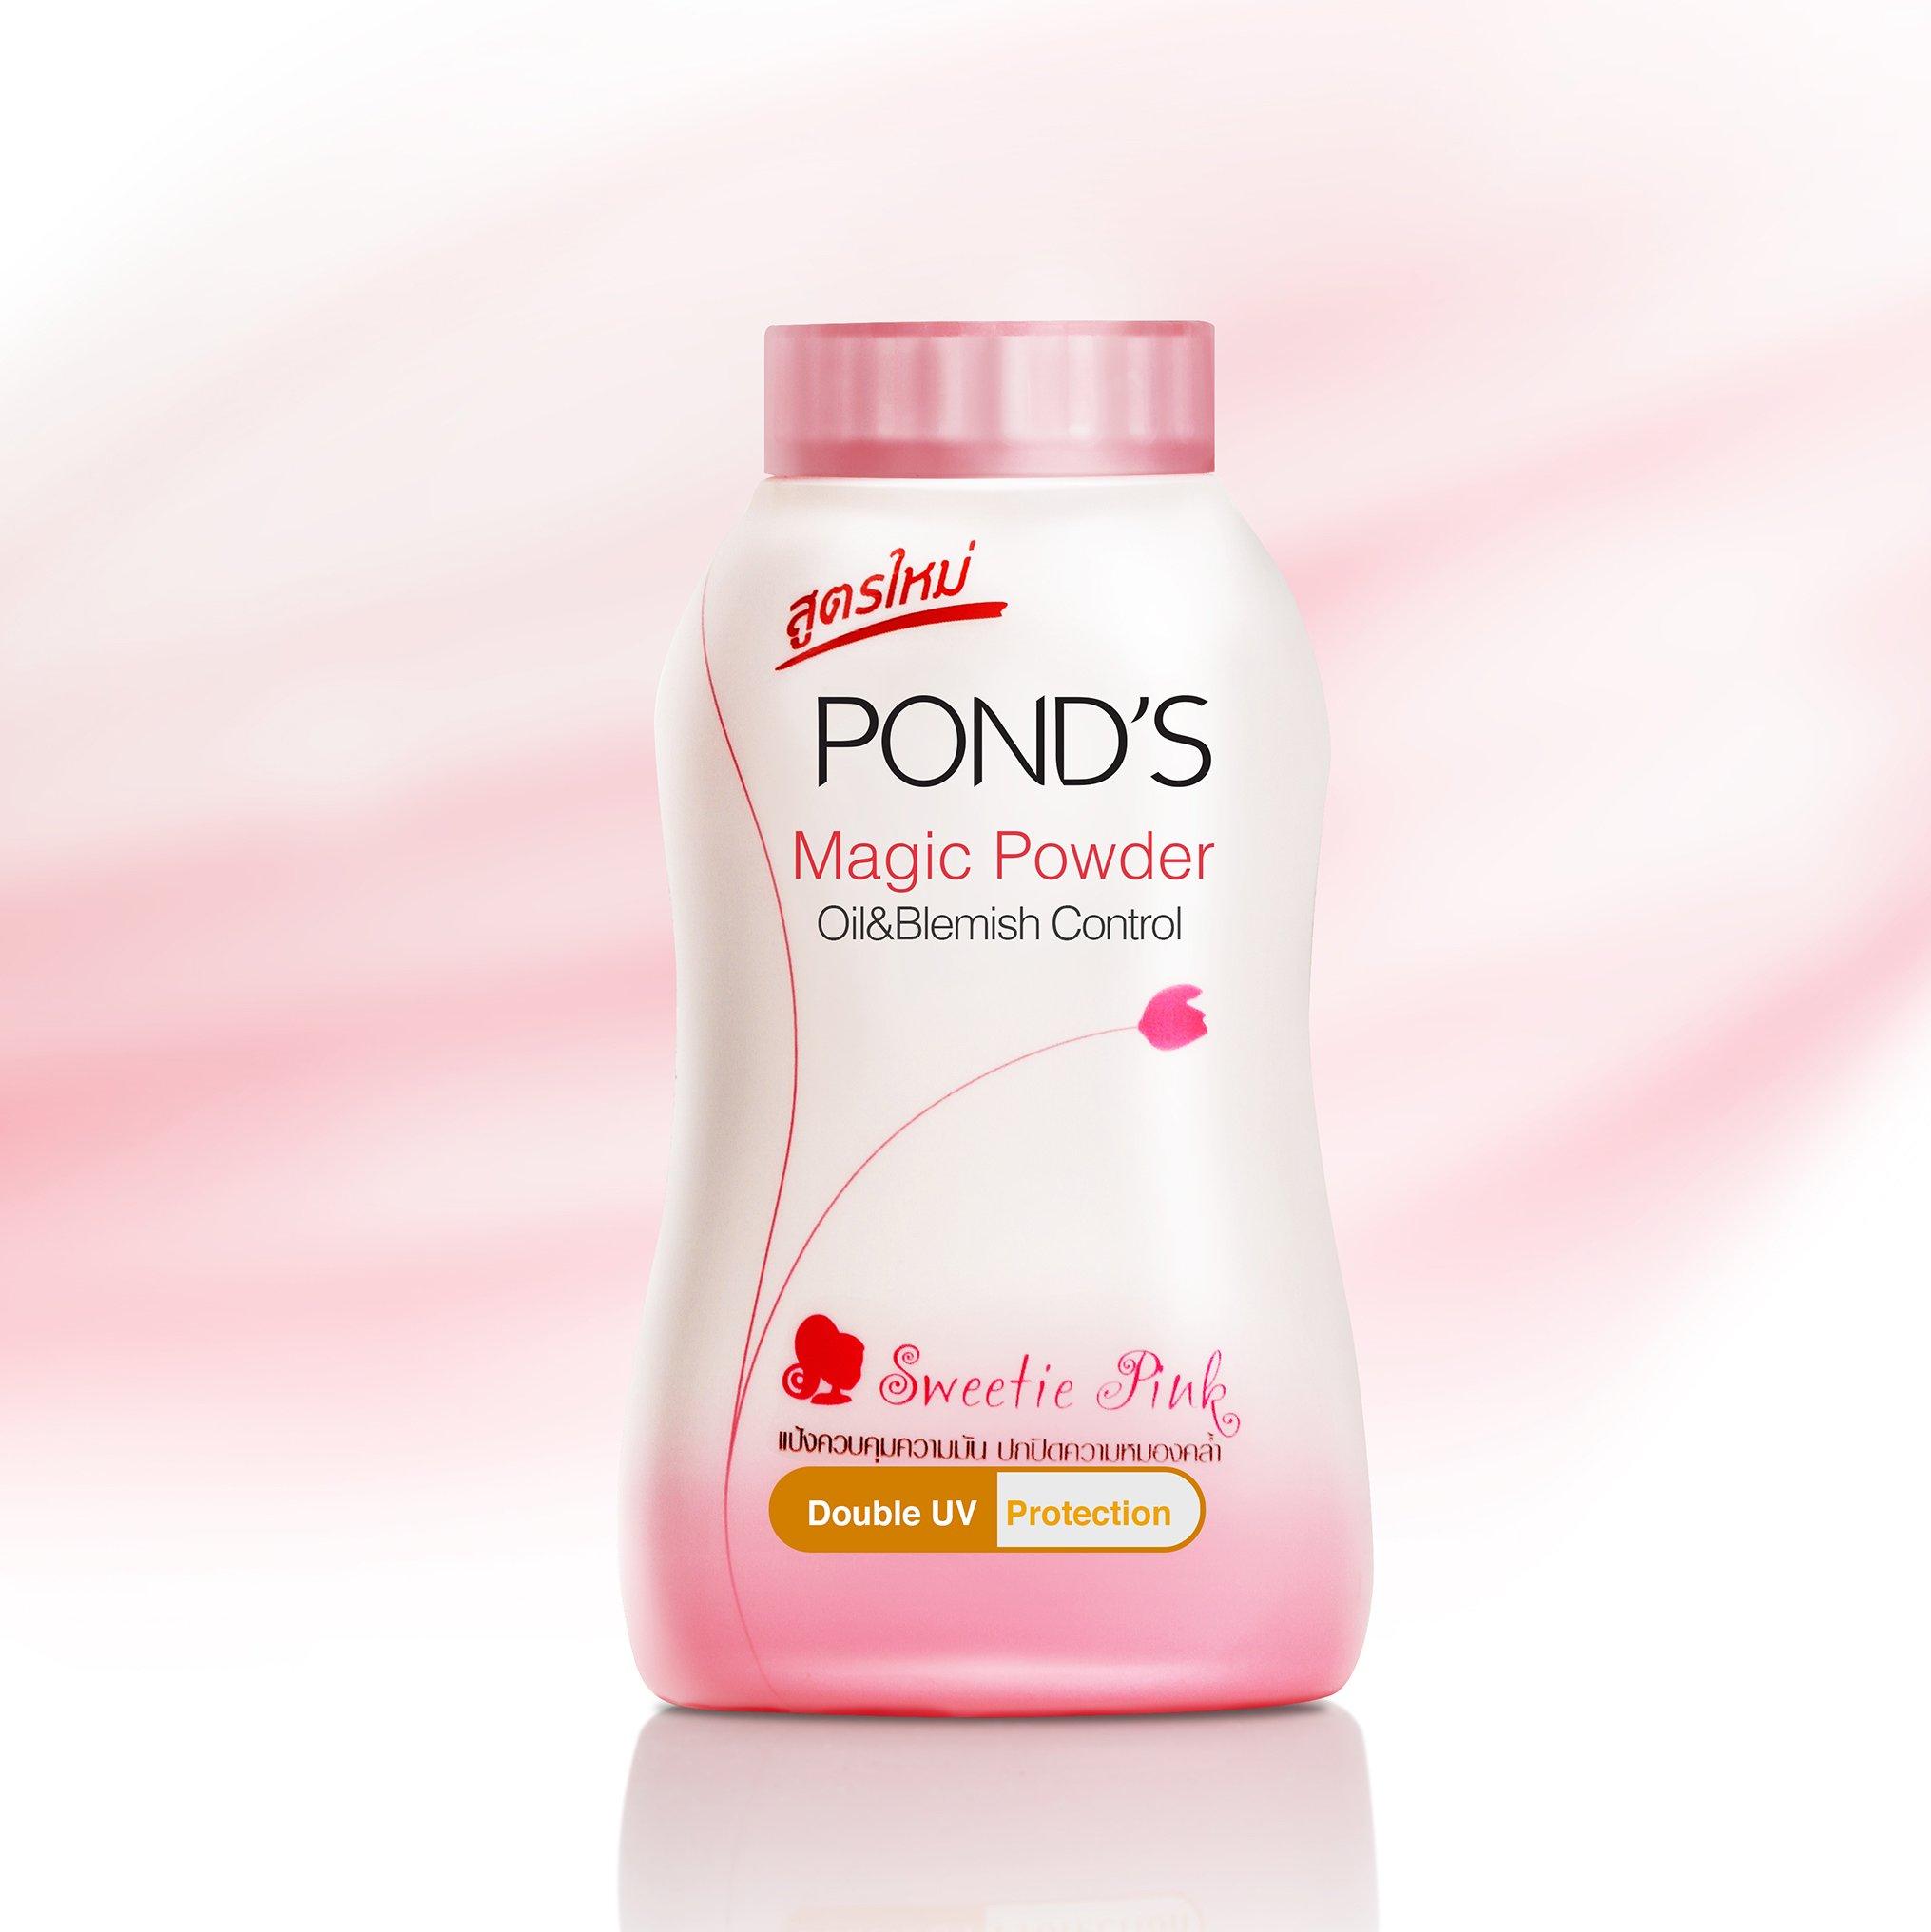 Review phấn phủ POND's magic power, sản phẩm dịu nhẹ cho làn da teen nhạy cảm!